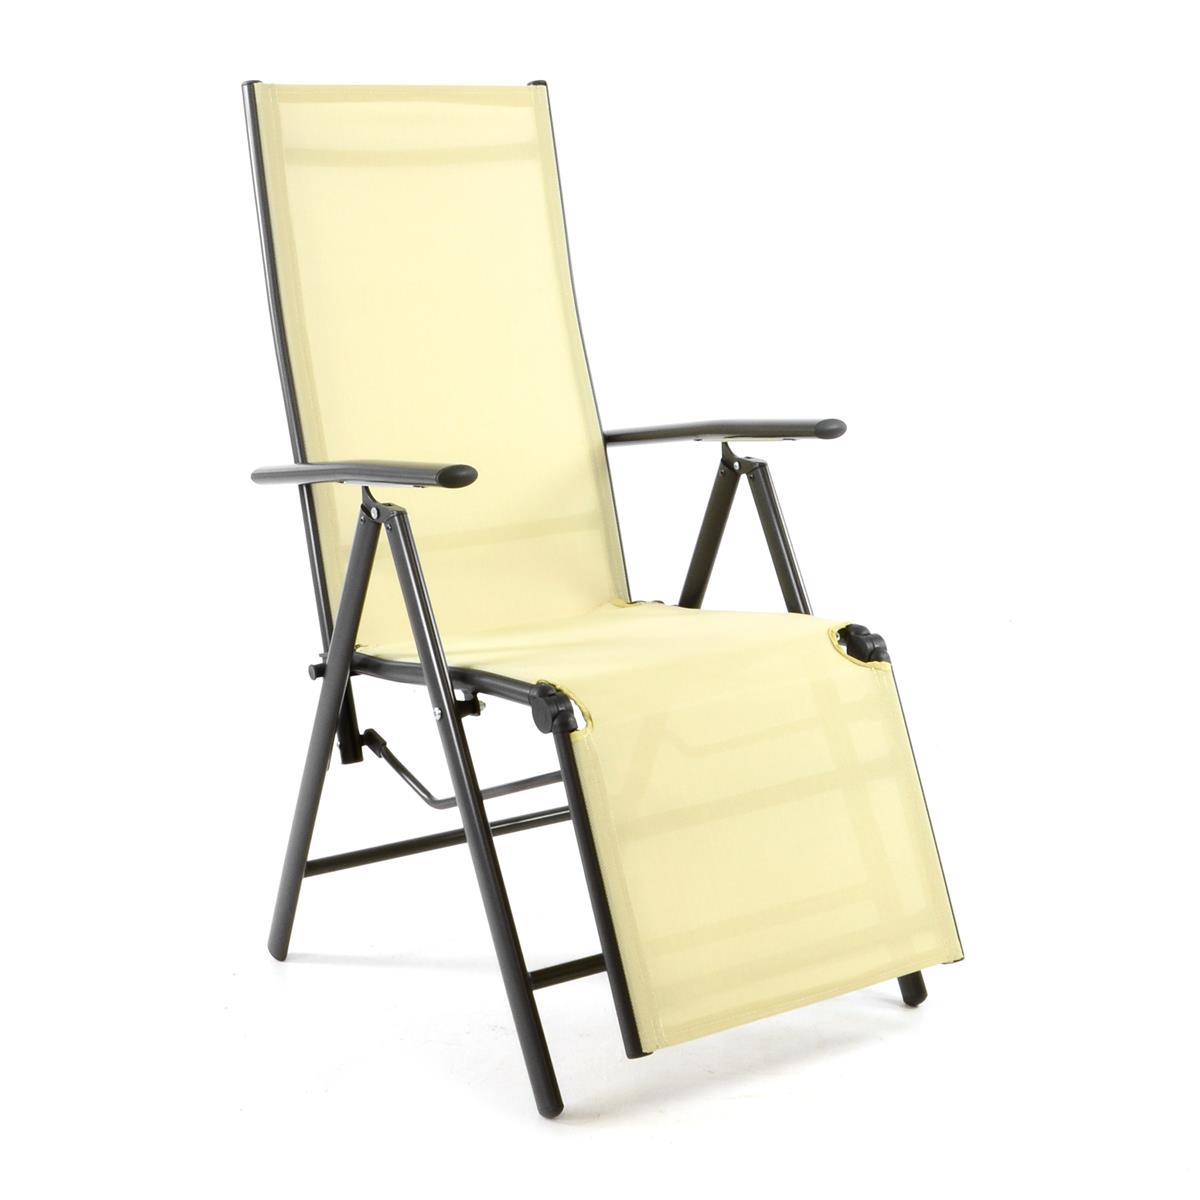 Alu Liegestuhl Klappstuhl Relaxstuhl Textilene creme Fußstütze Rahmen anthrazit